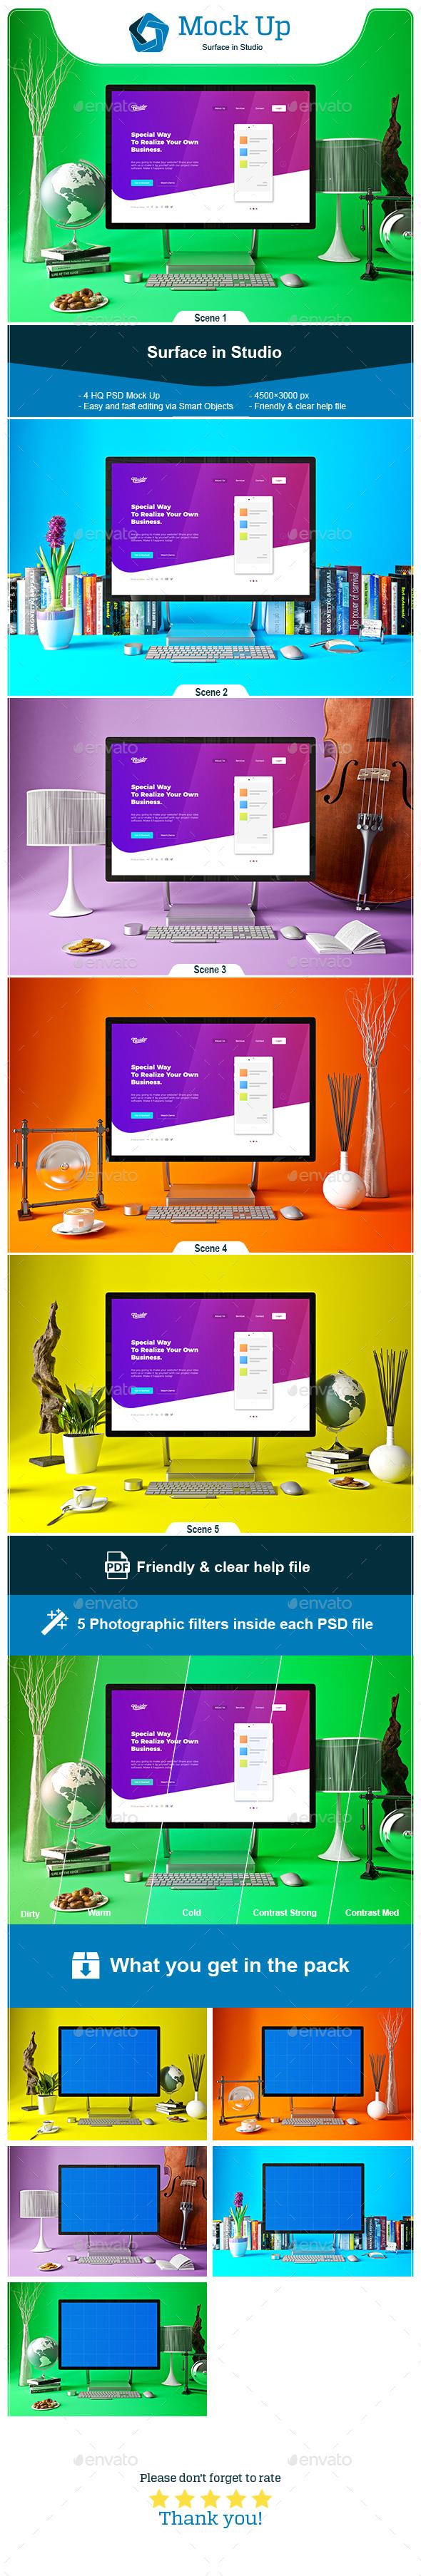 Surface in Studio - Monitors Displays